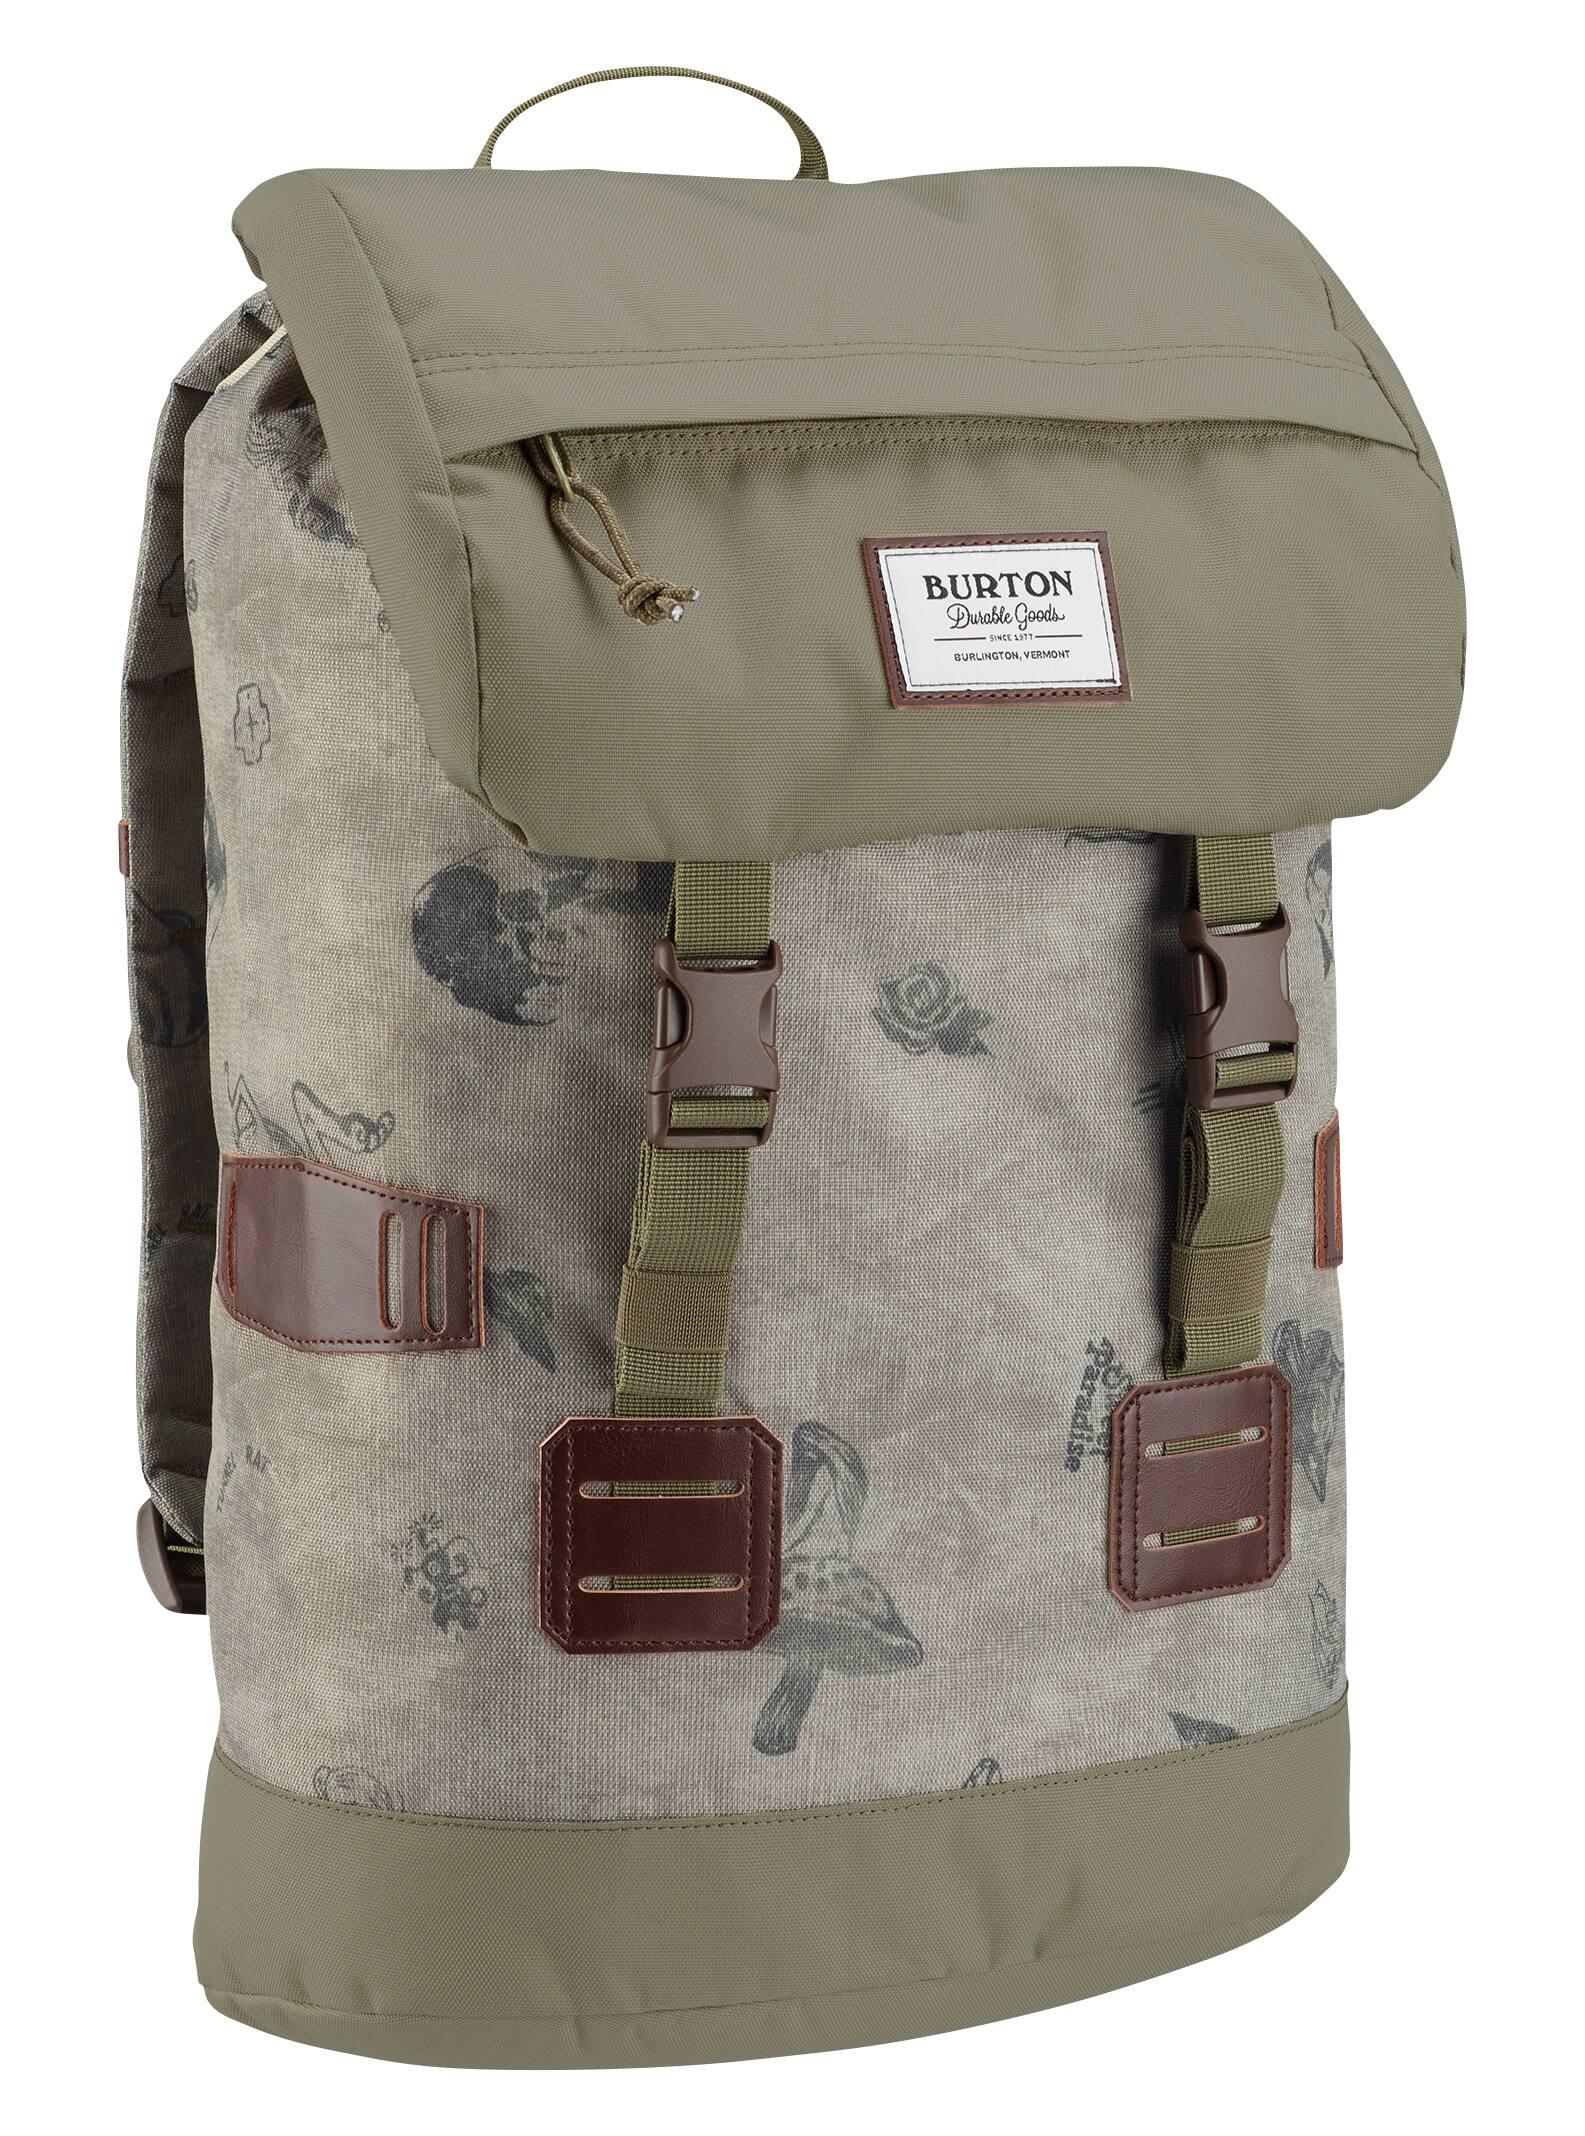 Burton Tinder Pack Grey Heather - 2018 - Unique u8F70